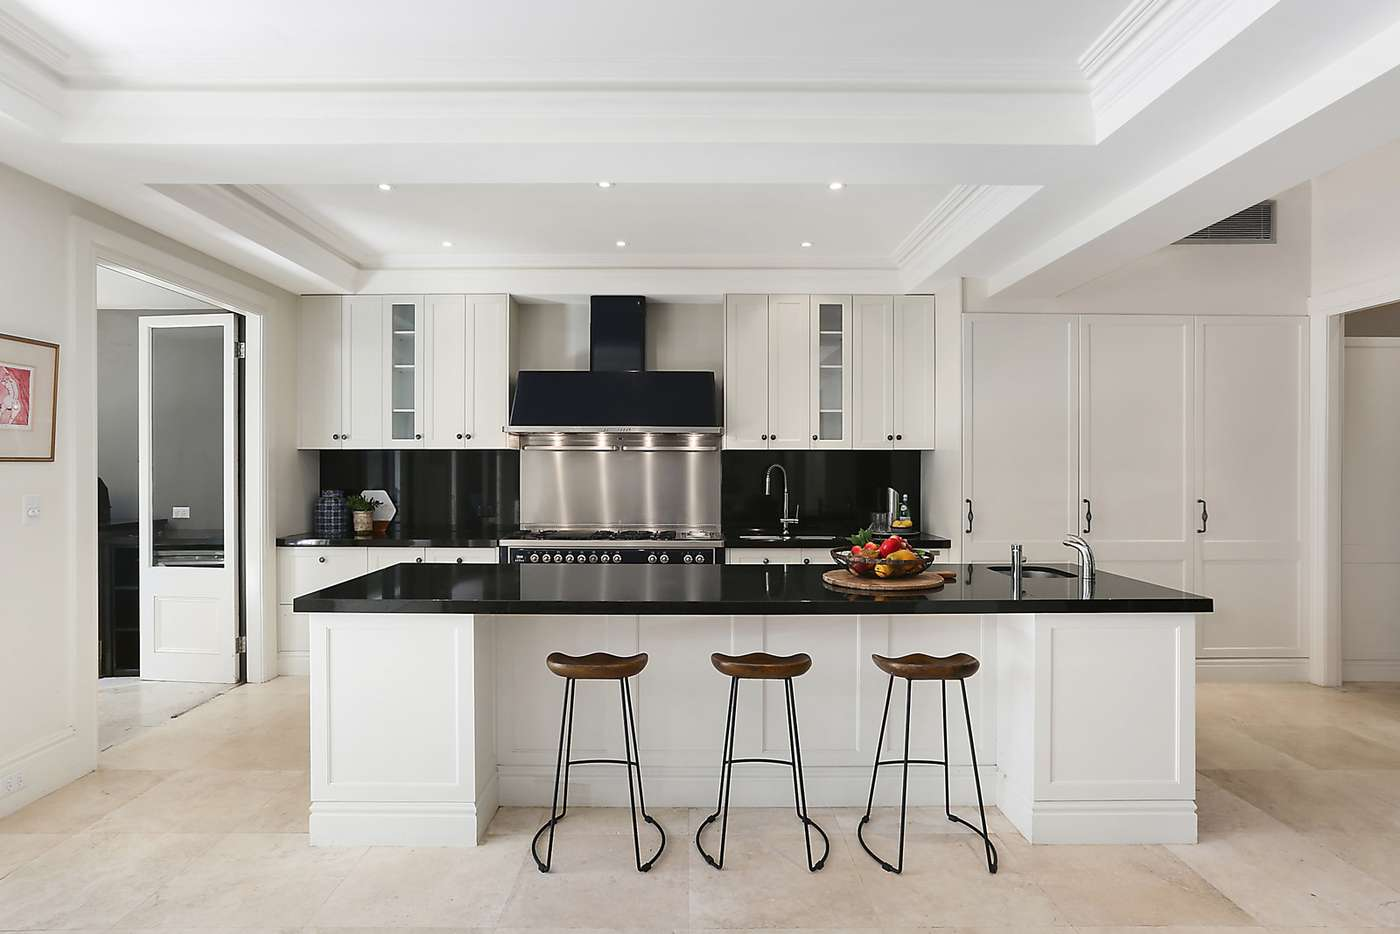 Sixth view of Homely house listing, 124-126 Paddington Street, Paddington NSW 2021